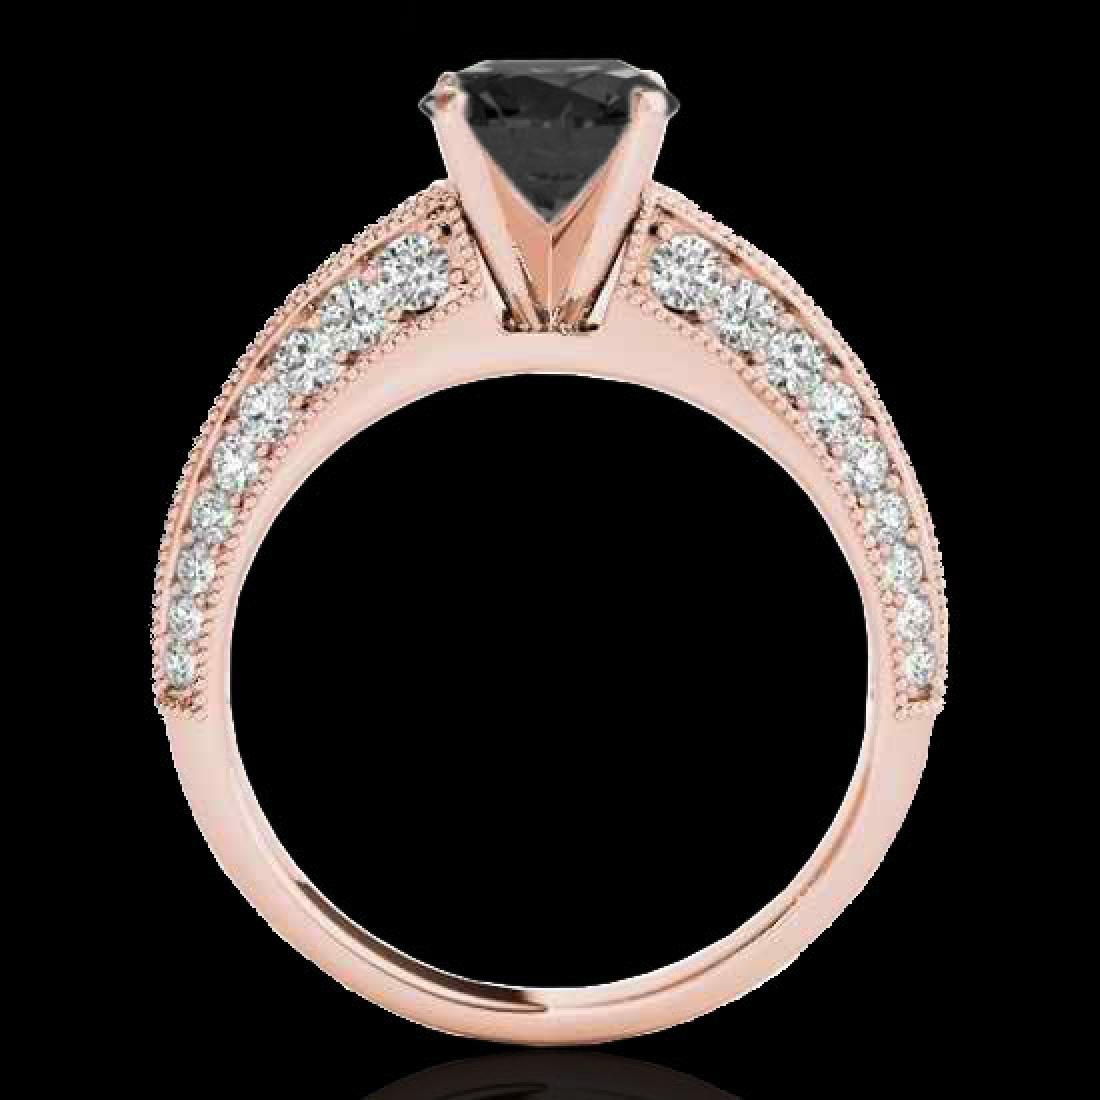 1.58 CTW Certified VS Black Diamond Solitaire Antique - 2